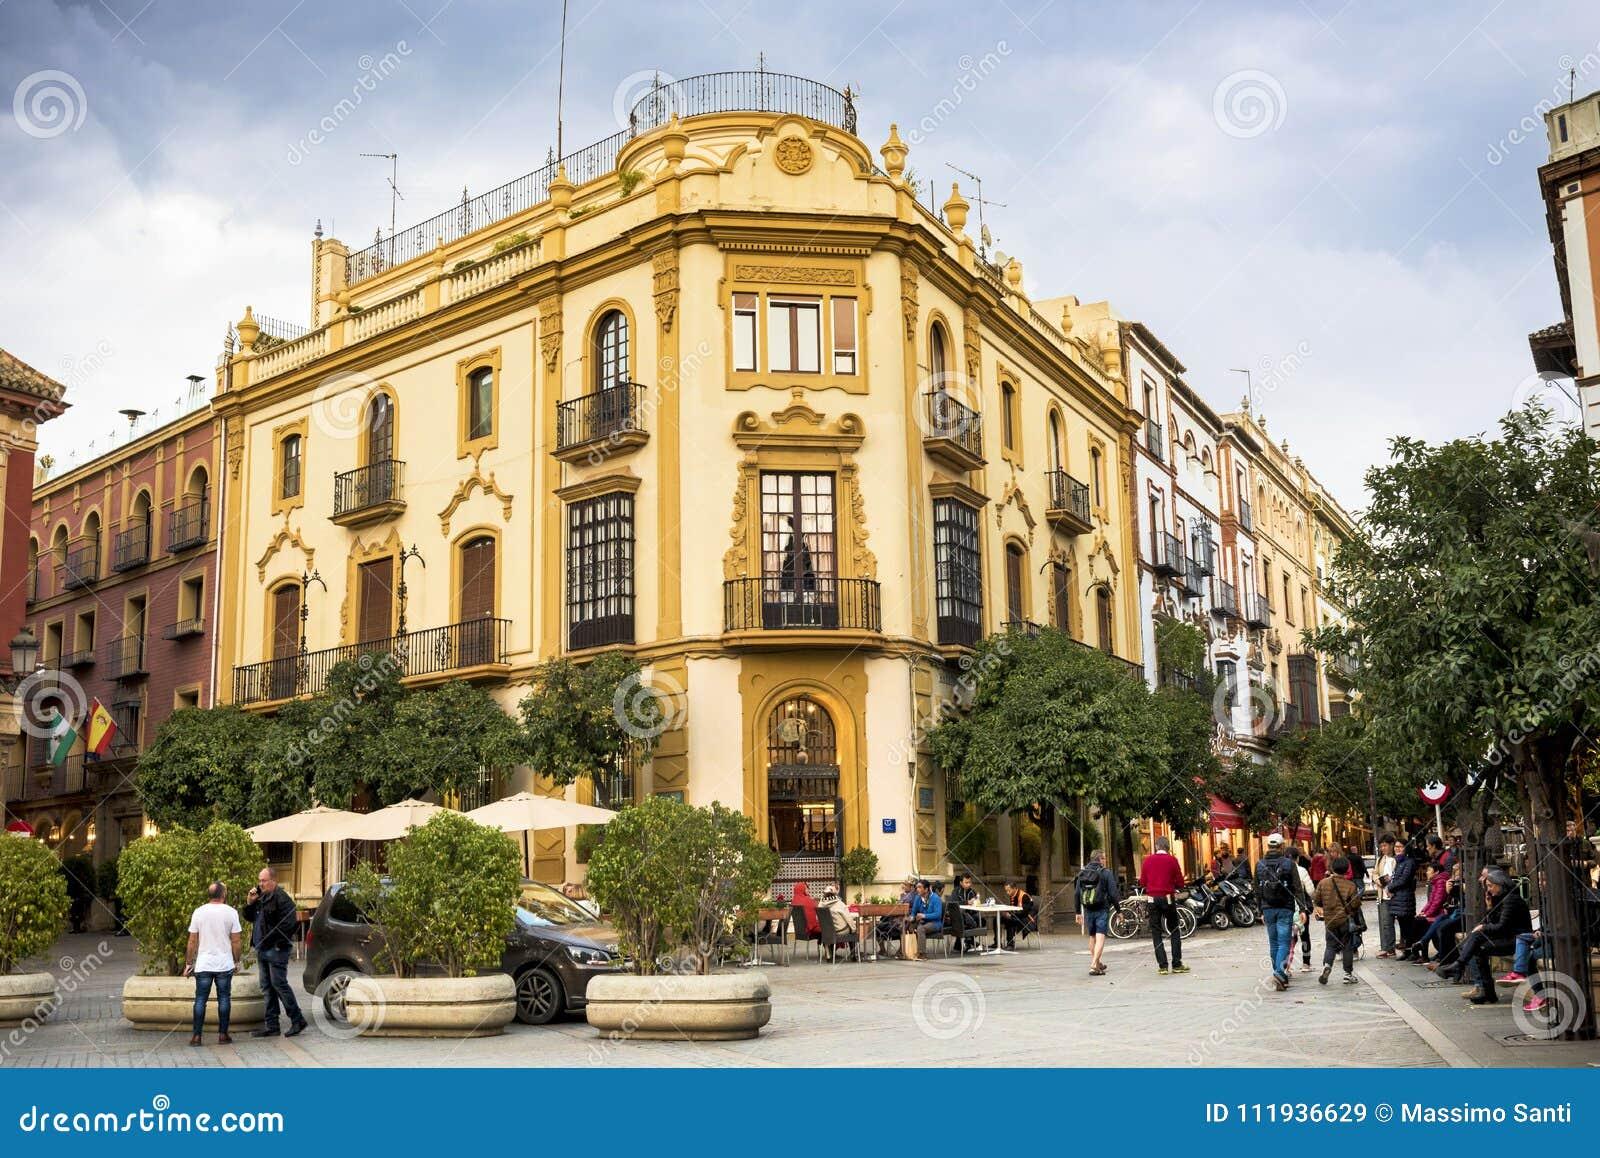 SEVILLE - SPANIEN: FEBRUARI 27, 2018 - Plaza Virgen de los Reyes spain